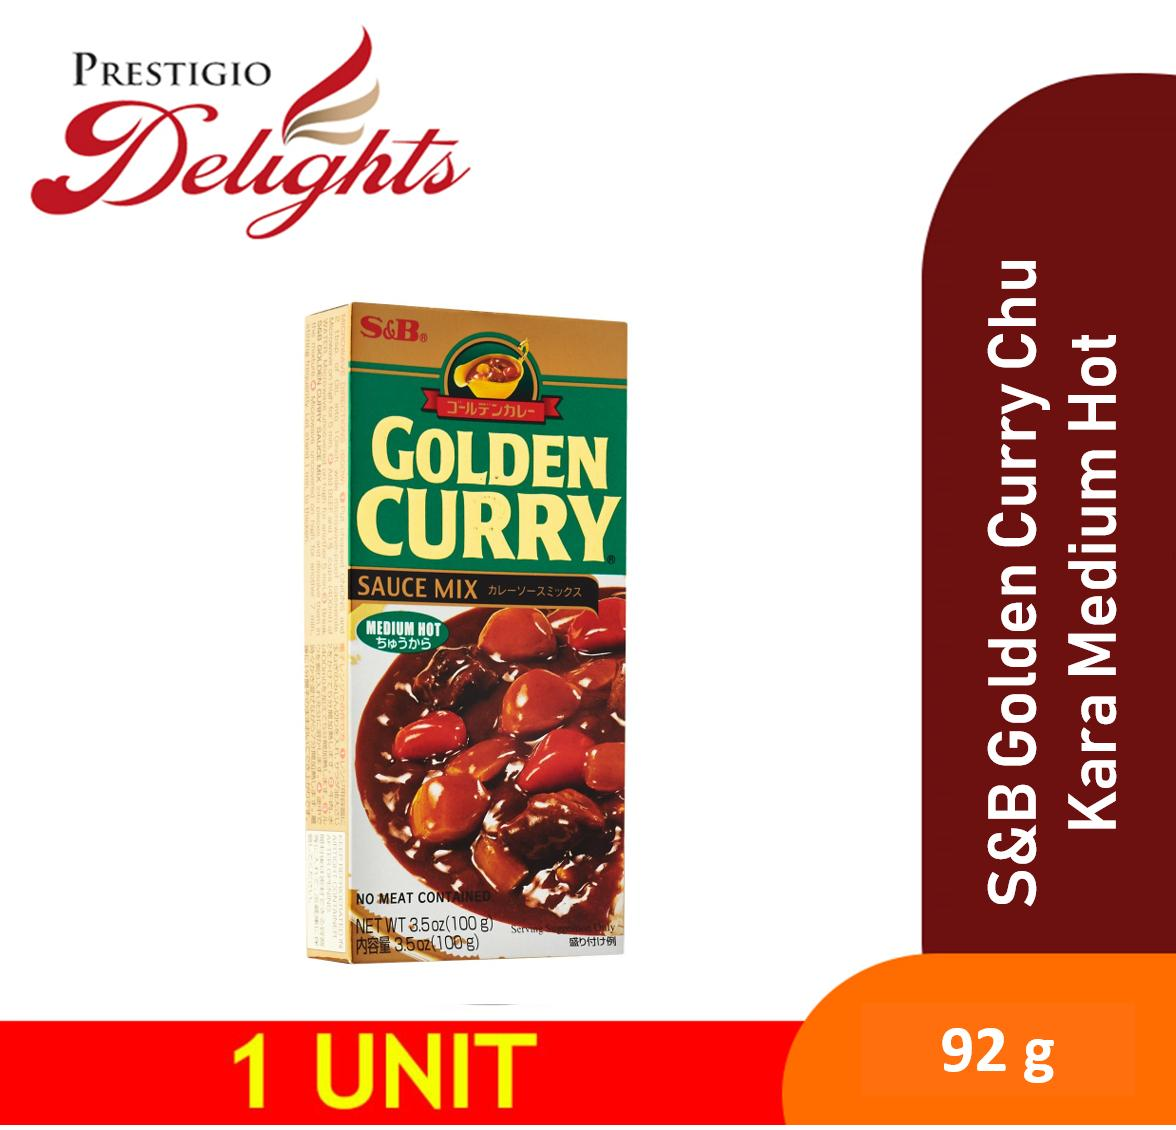 S&b Golden Curry Chu Kara Medium Hot Instant Curry 92g By Prestigio Delights.